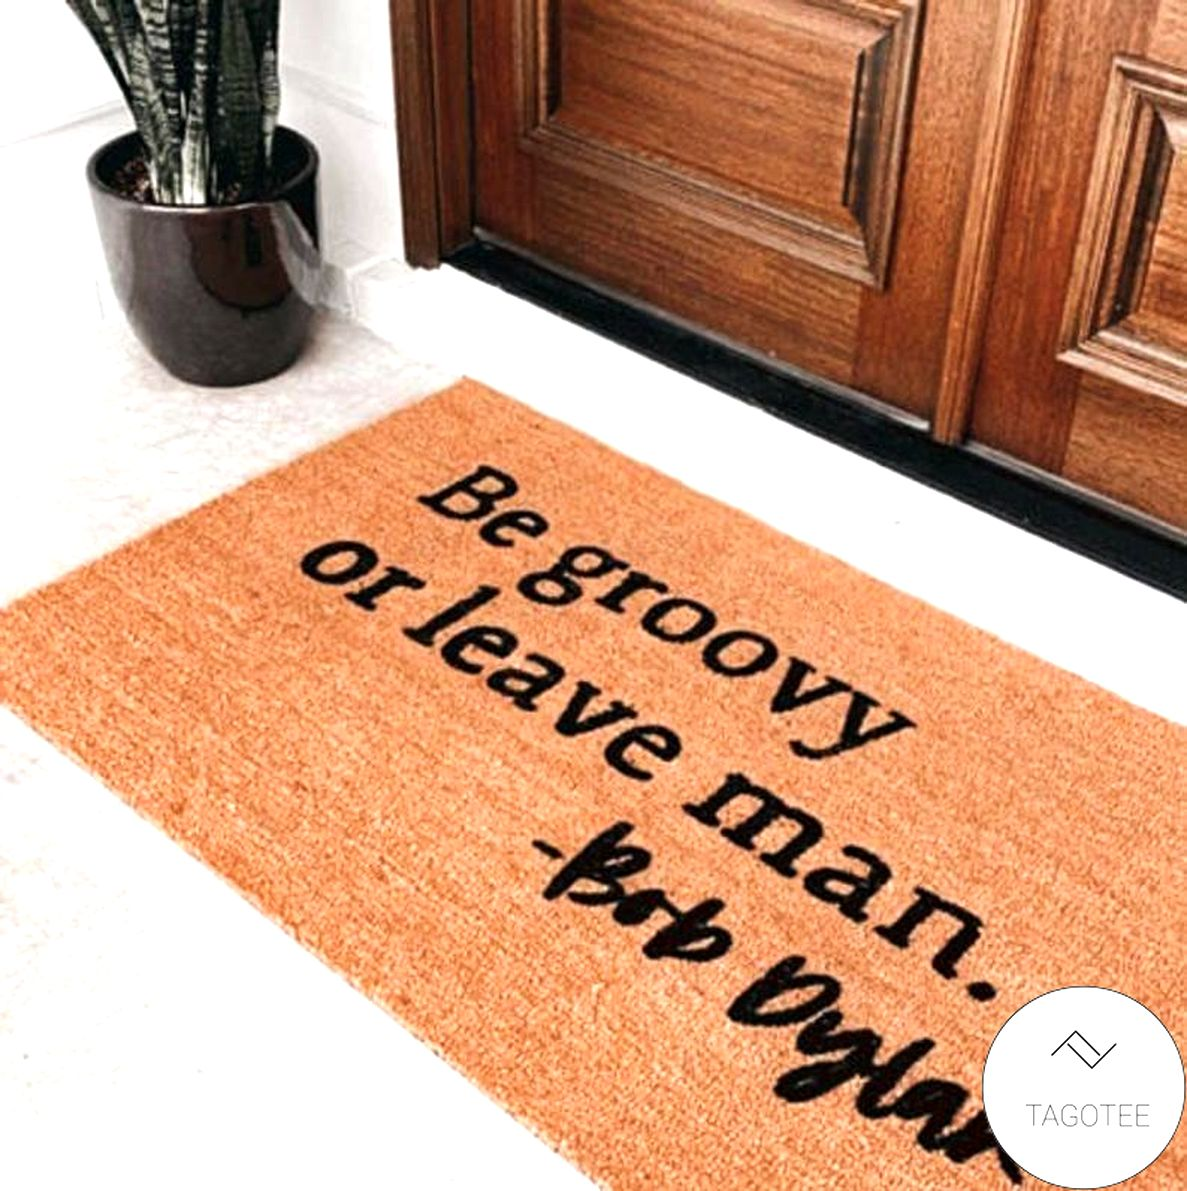 Be Groovy Or Leave Man Bob Dylan Doormat